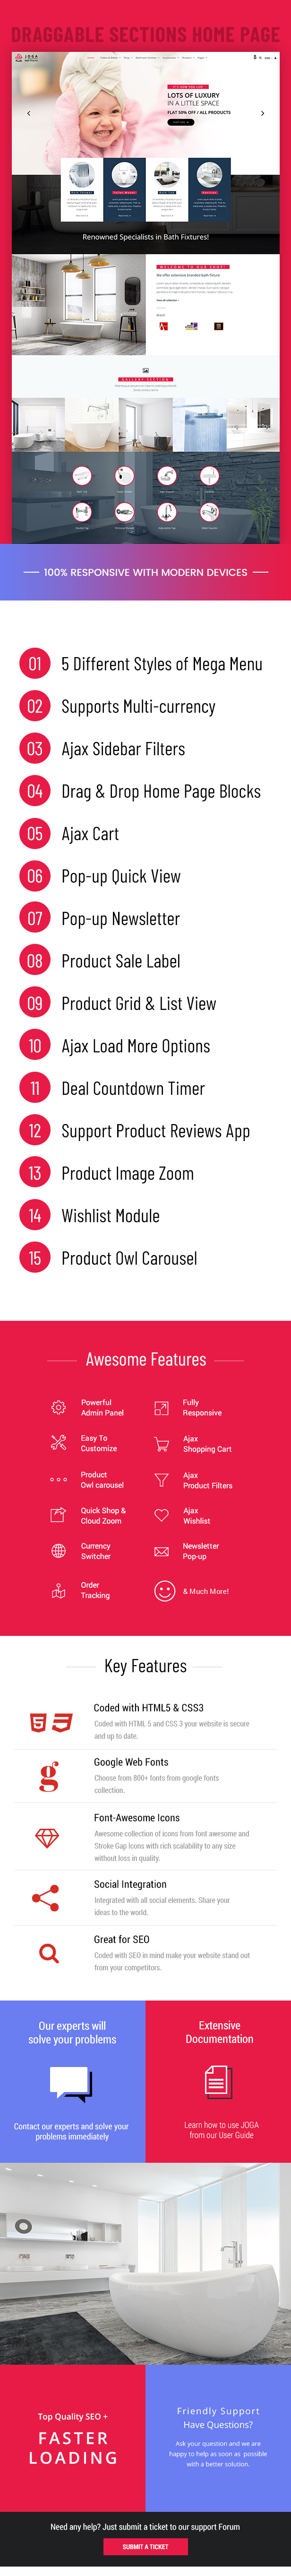 浴室配件销售商店网站Shopify主题模板 Bathroom Accessories Sales Store Website Shopify Theme Template插图